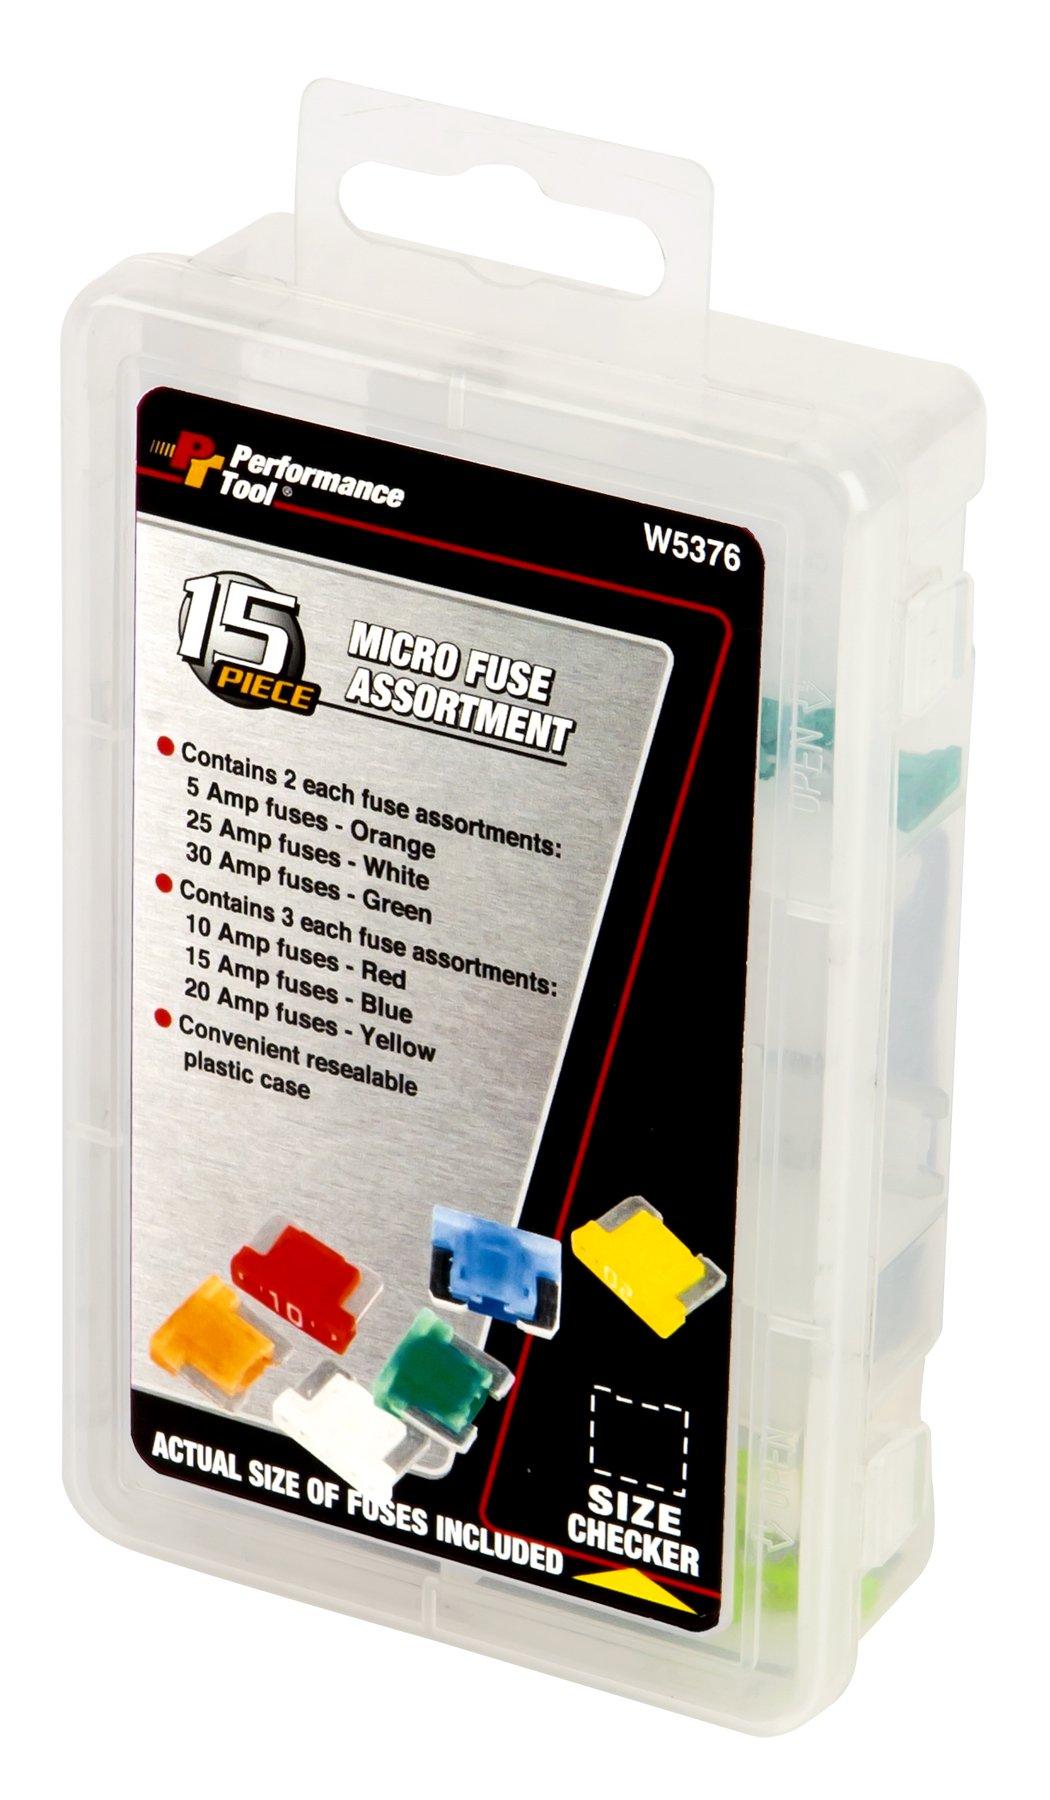 Performance Tool W5376 15-Piece Micro Fuse Assortment